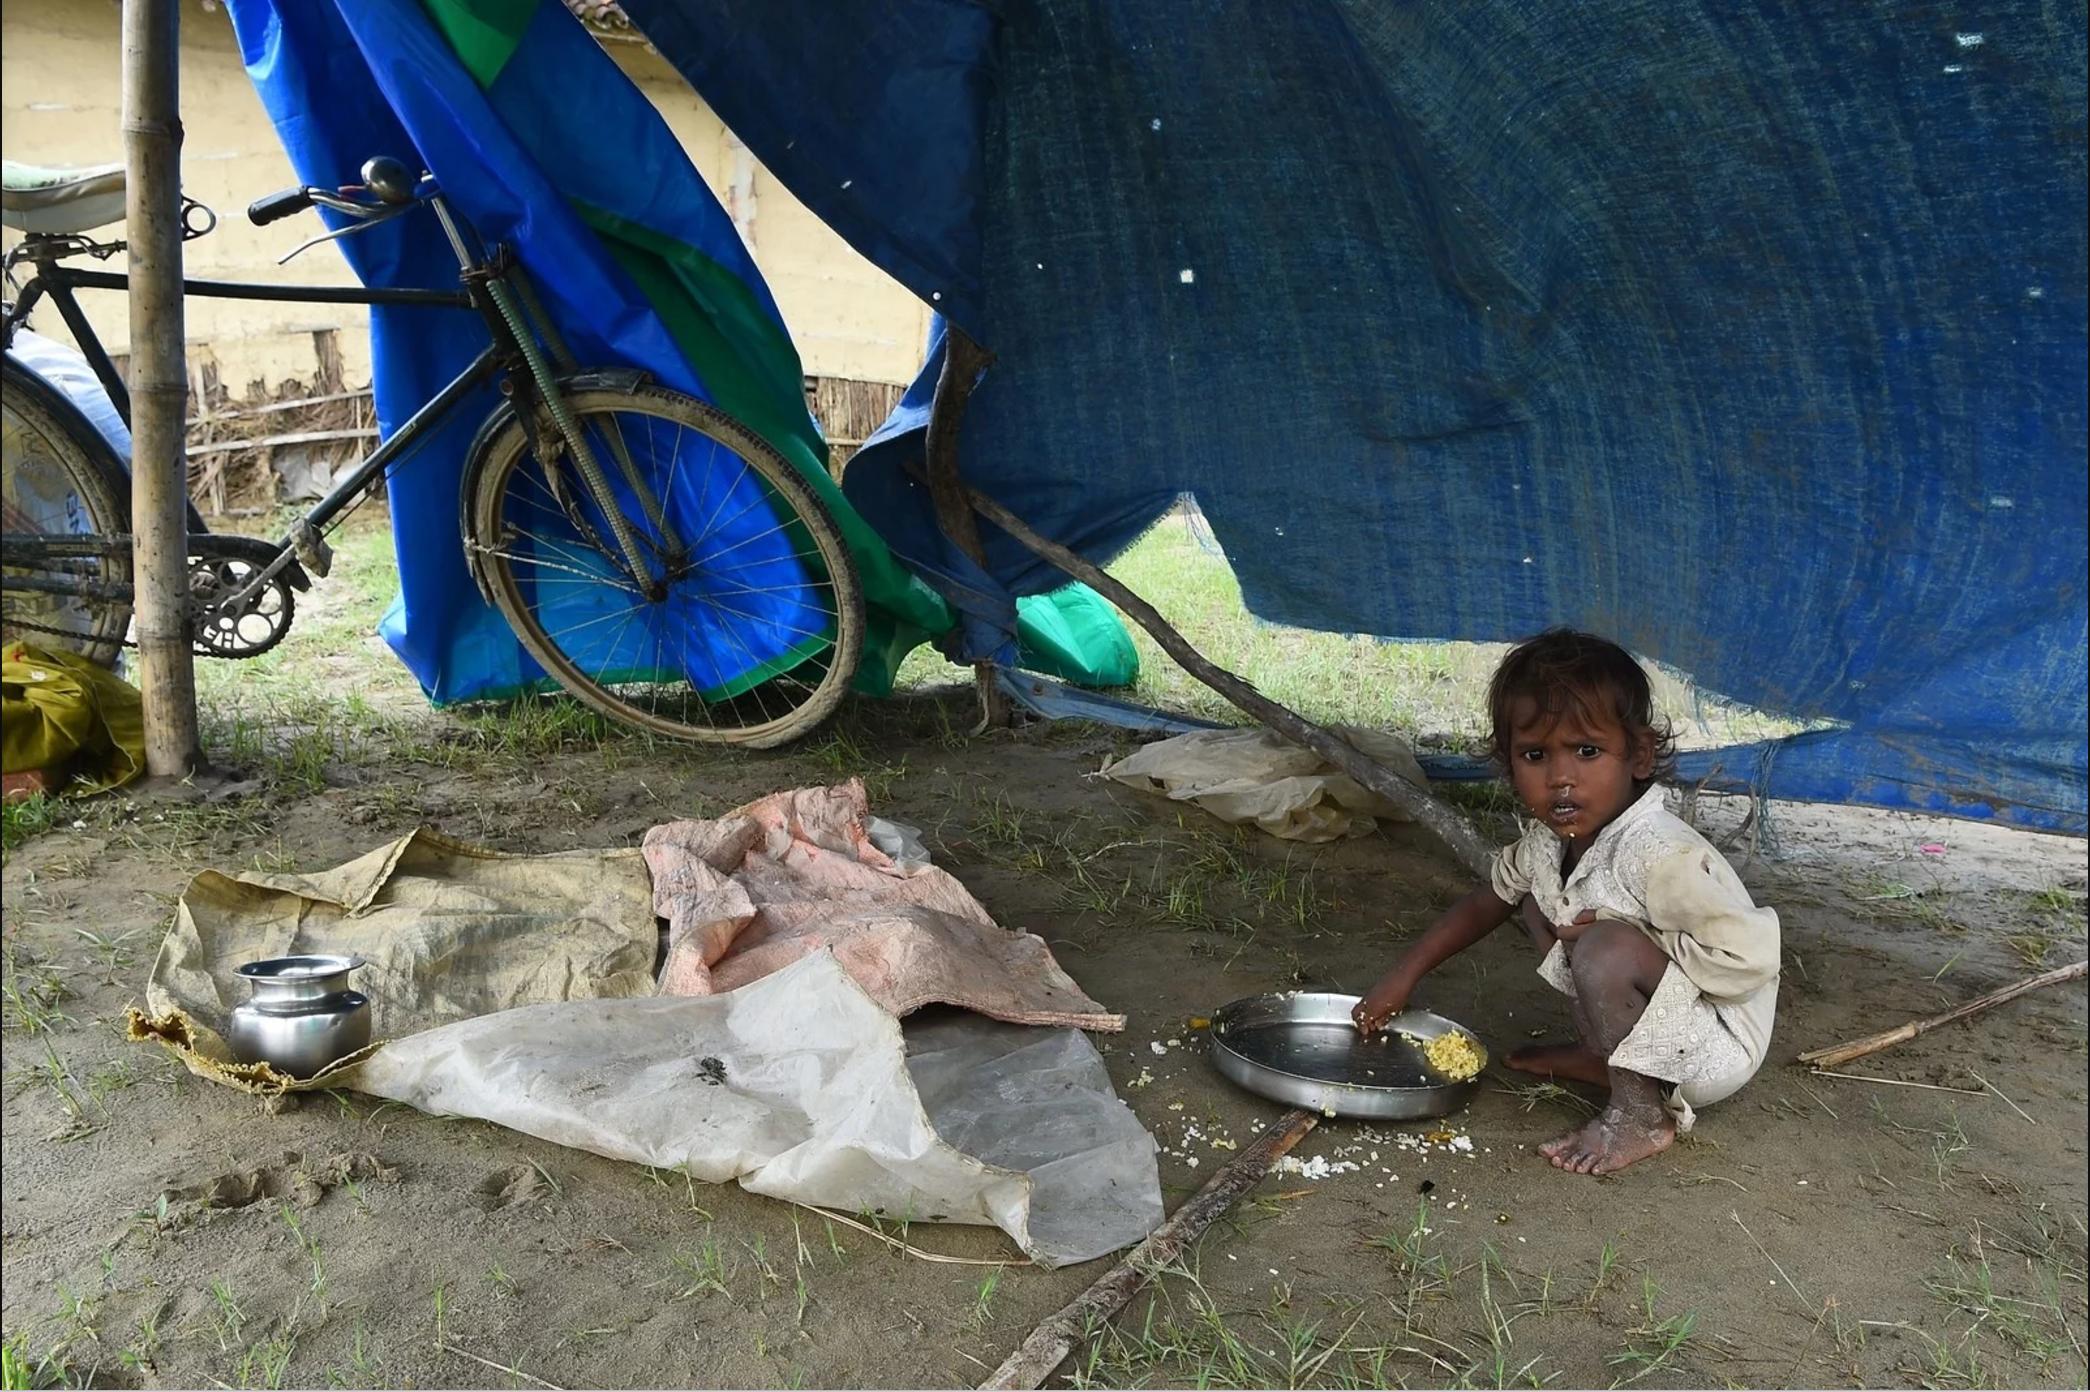 A child eats at a makeshift flood shelter in Gaur, about 200 km south of Kathmandu, the Nepali capital.Prakash Mathema / AFP / Getty Images